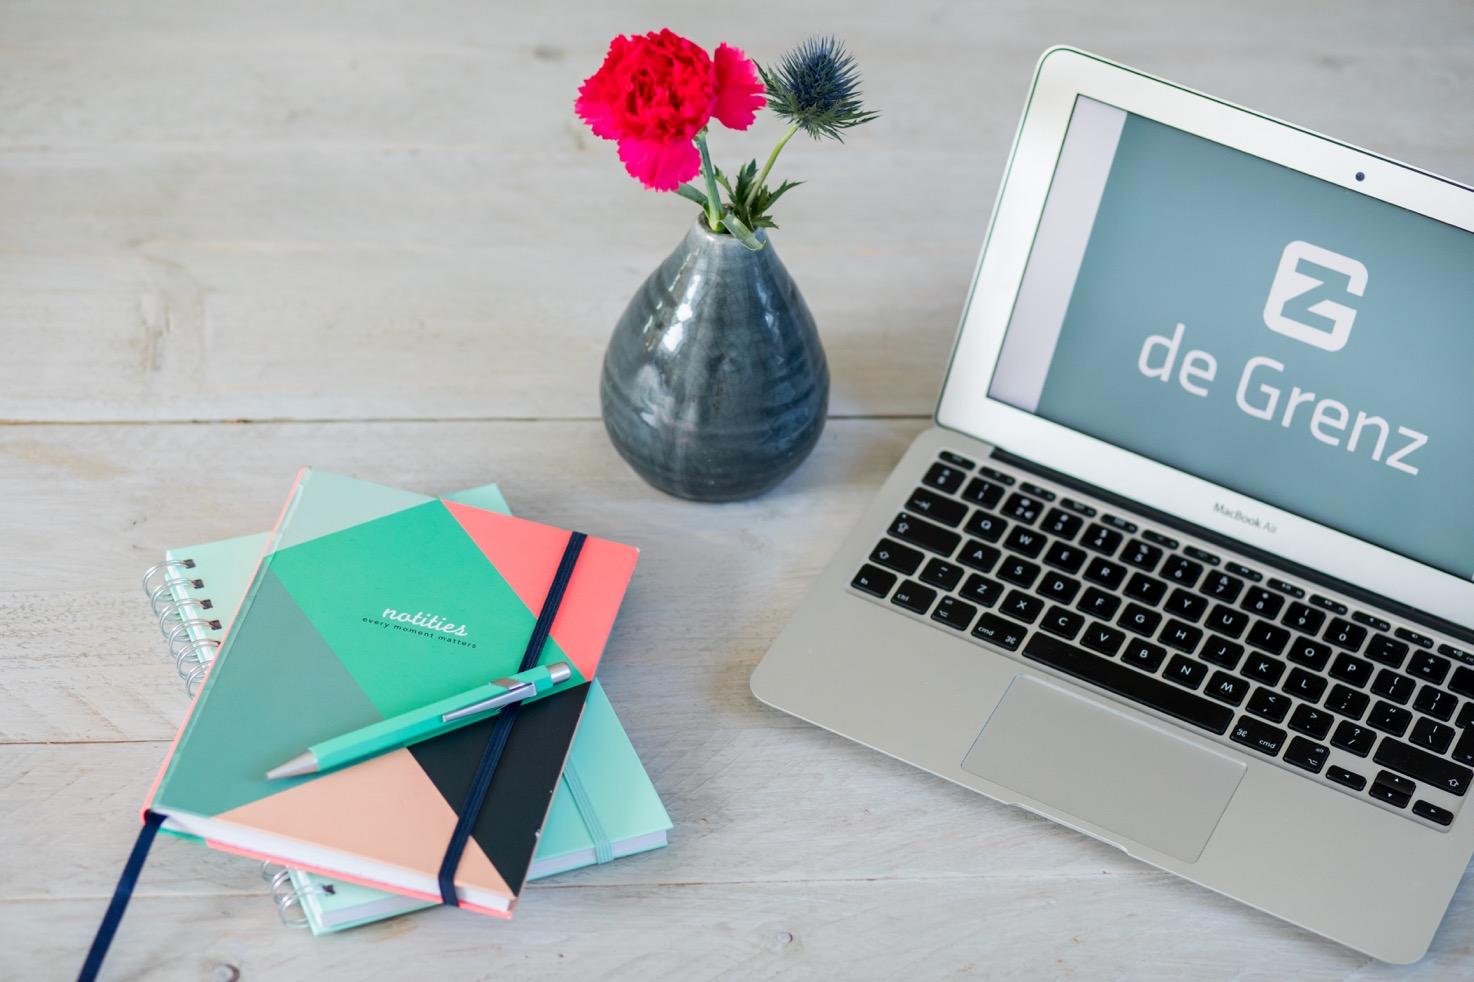 de-grenz-computer-logo